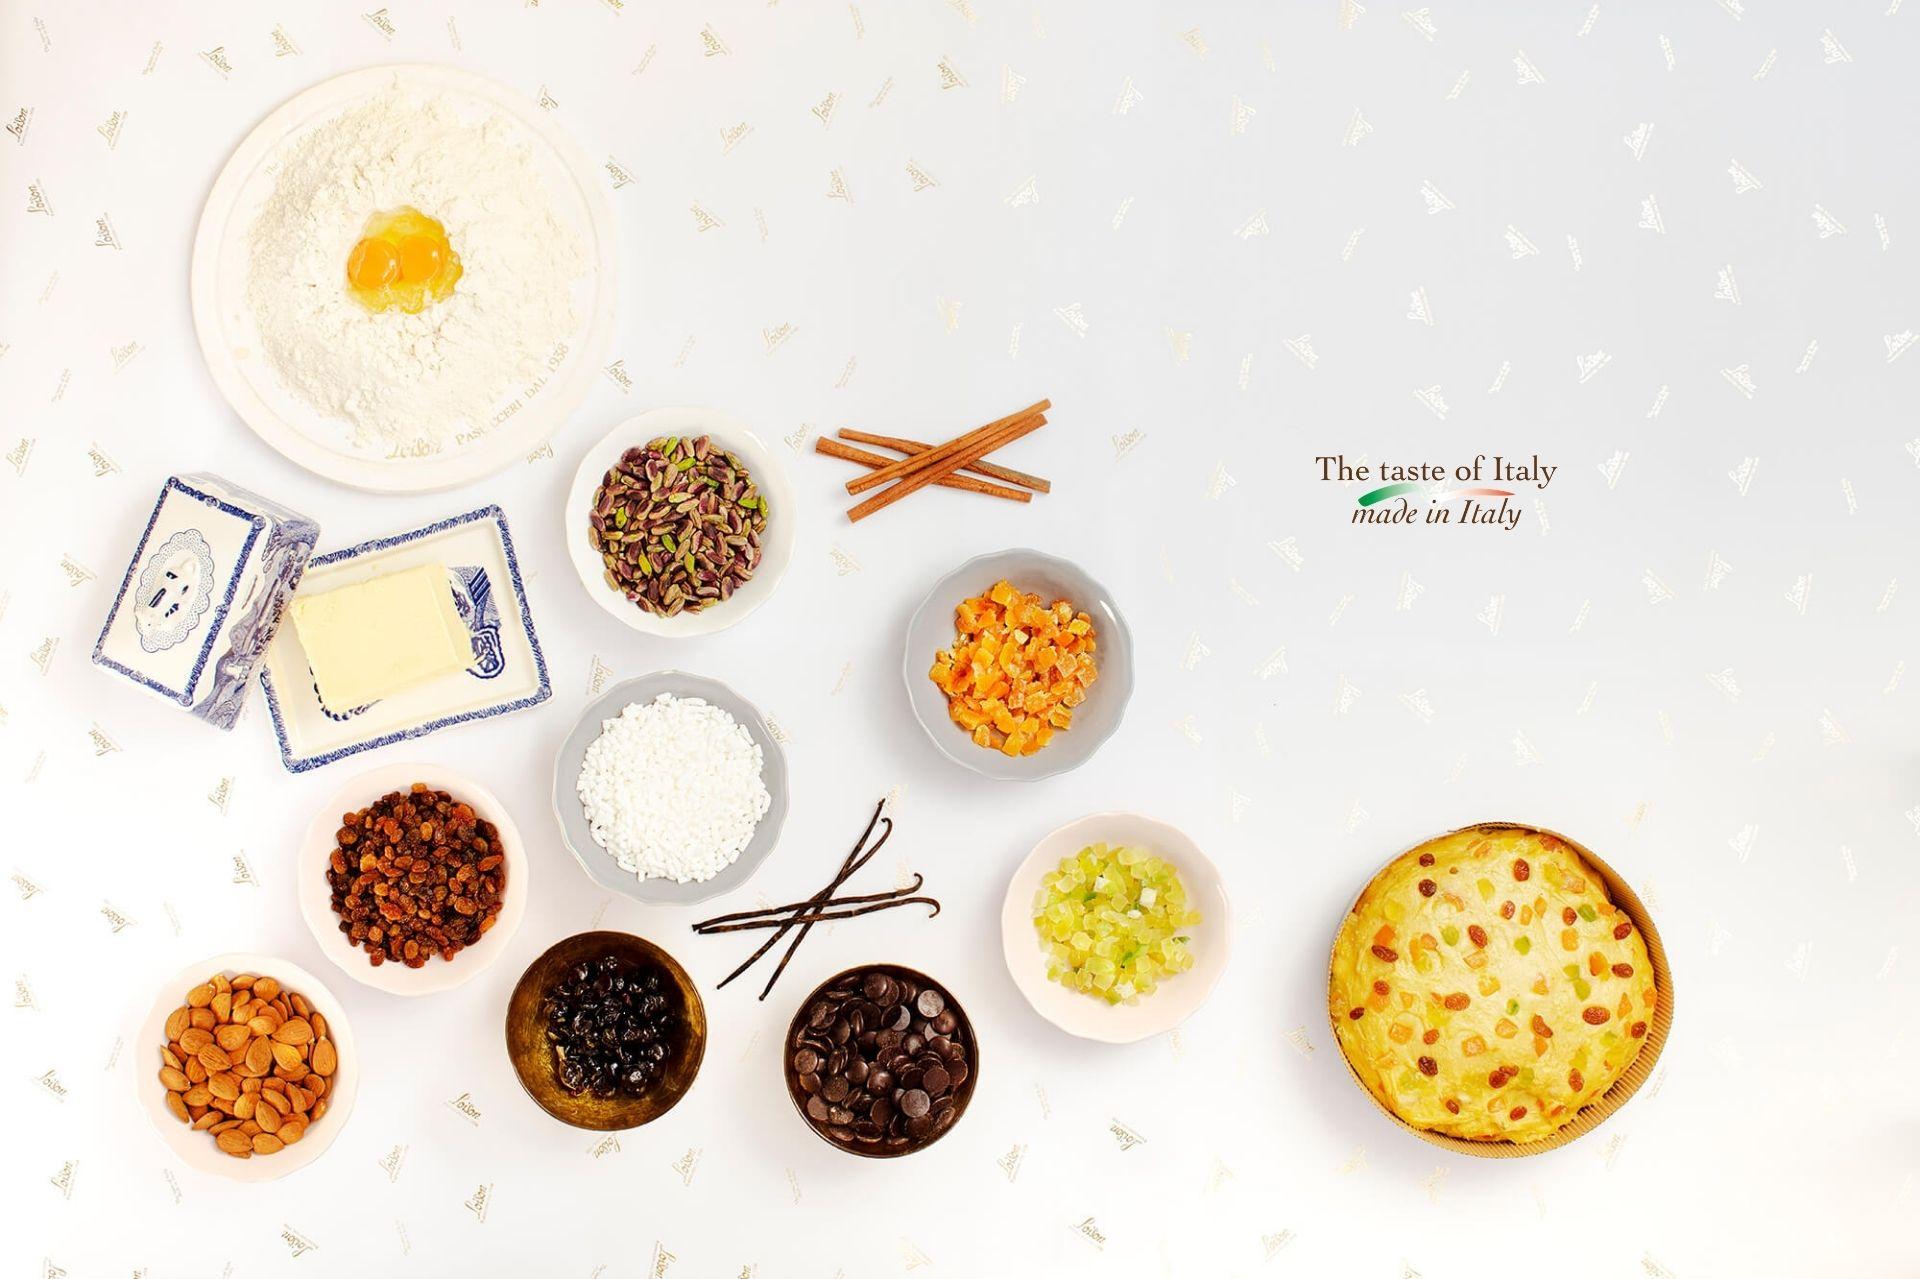 Panettoni artigianali ingredienti d'eccellenza